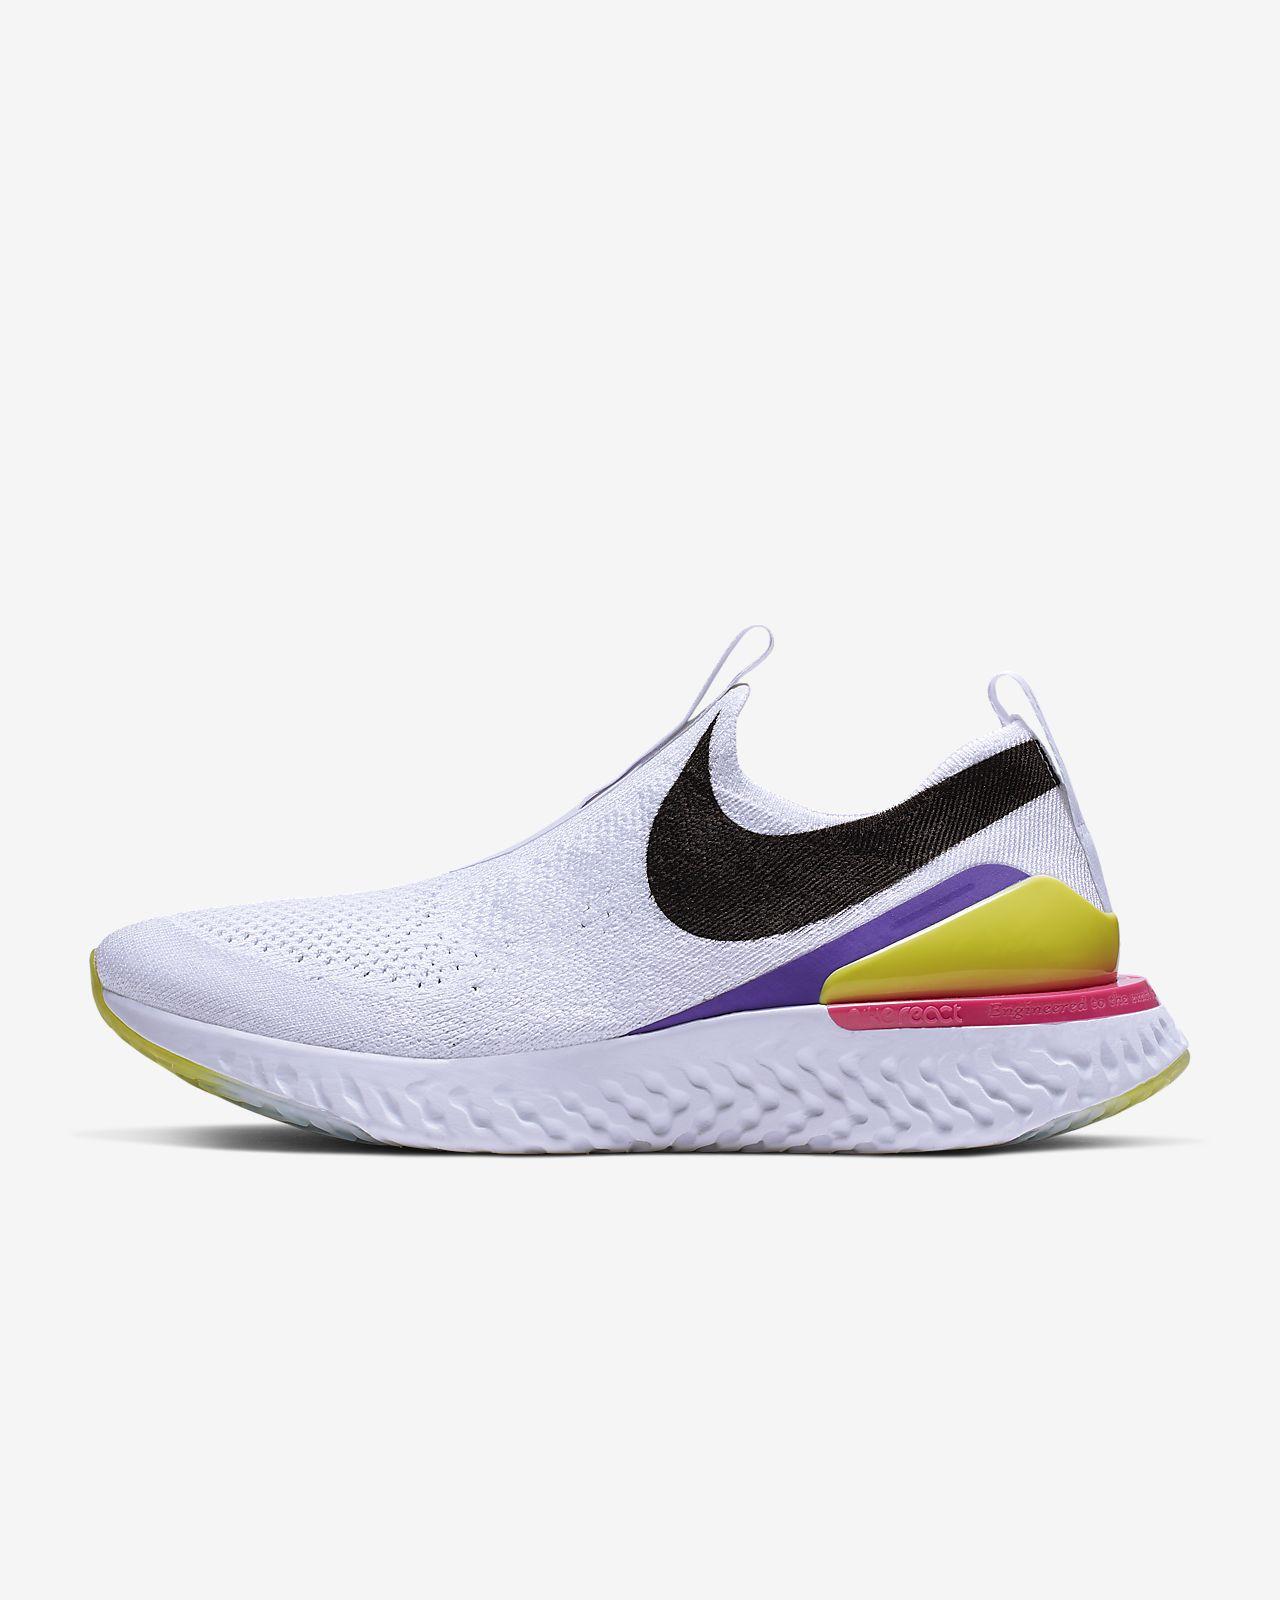 Sapatilhas de running Nike Epic Phantom React para mulher